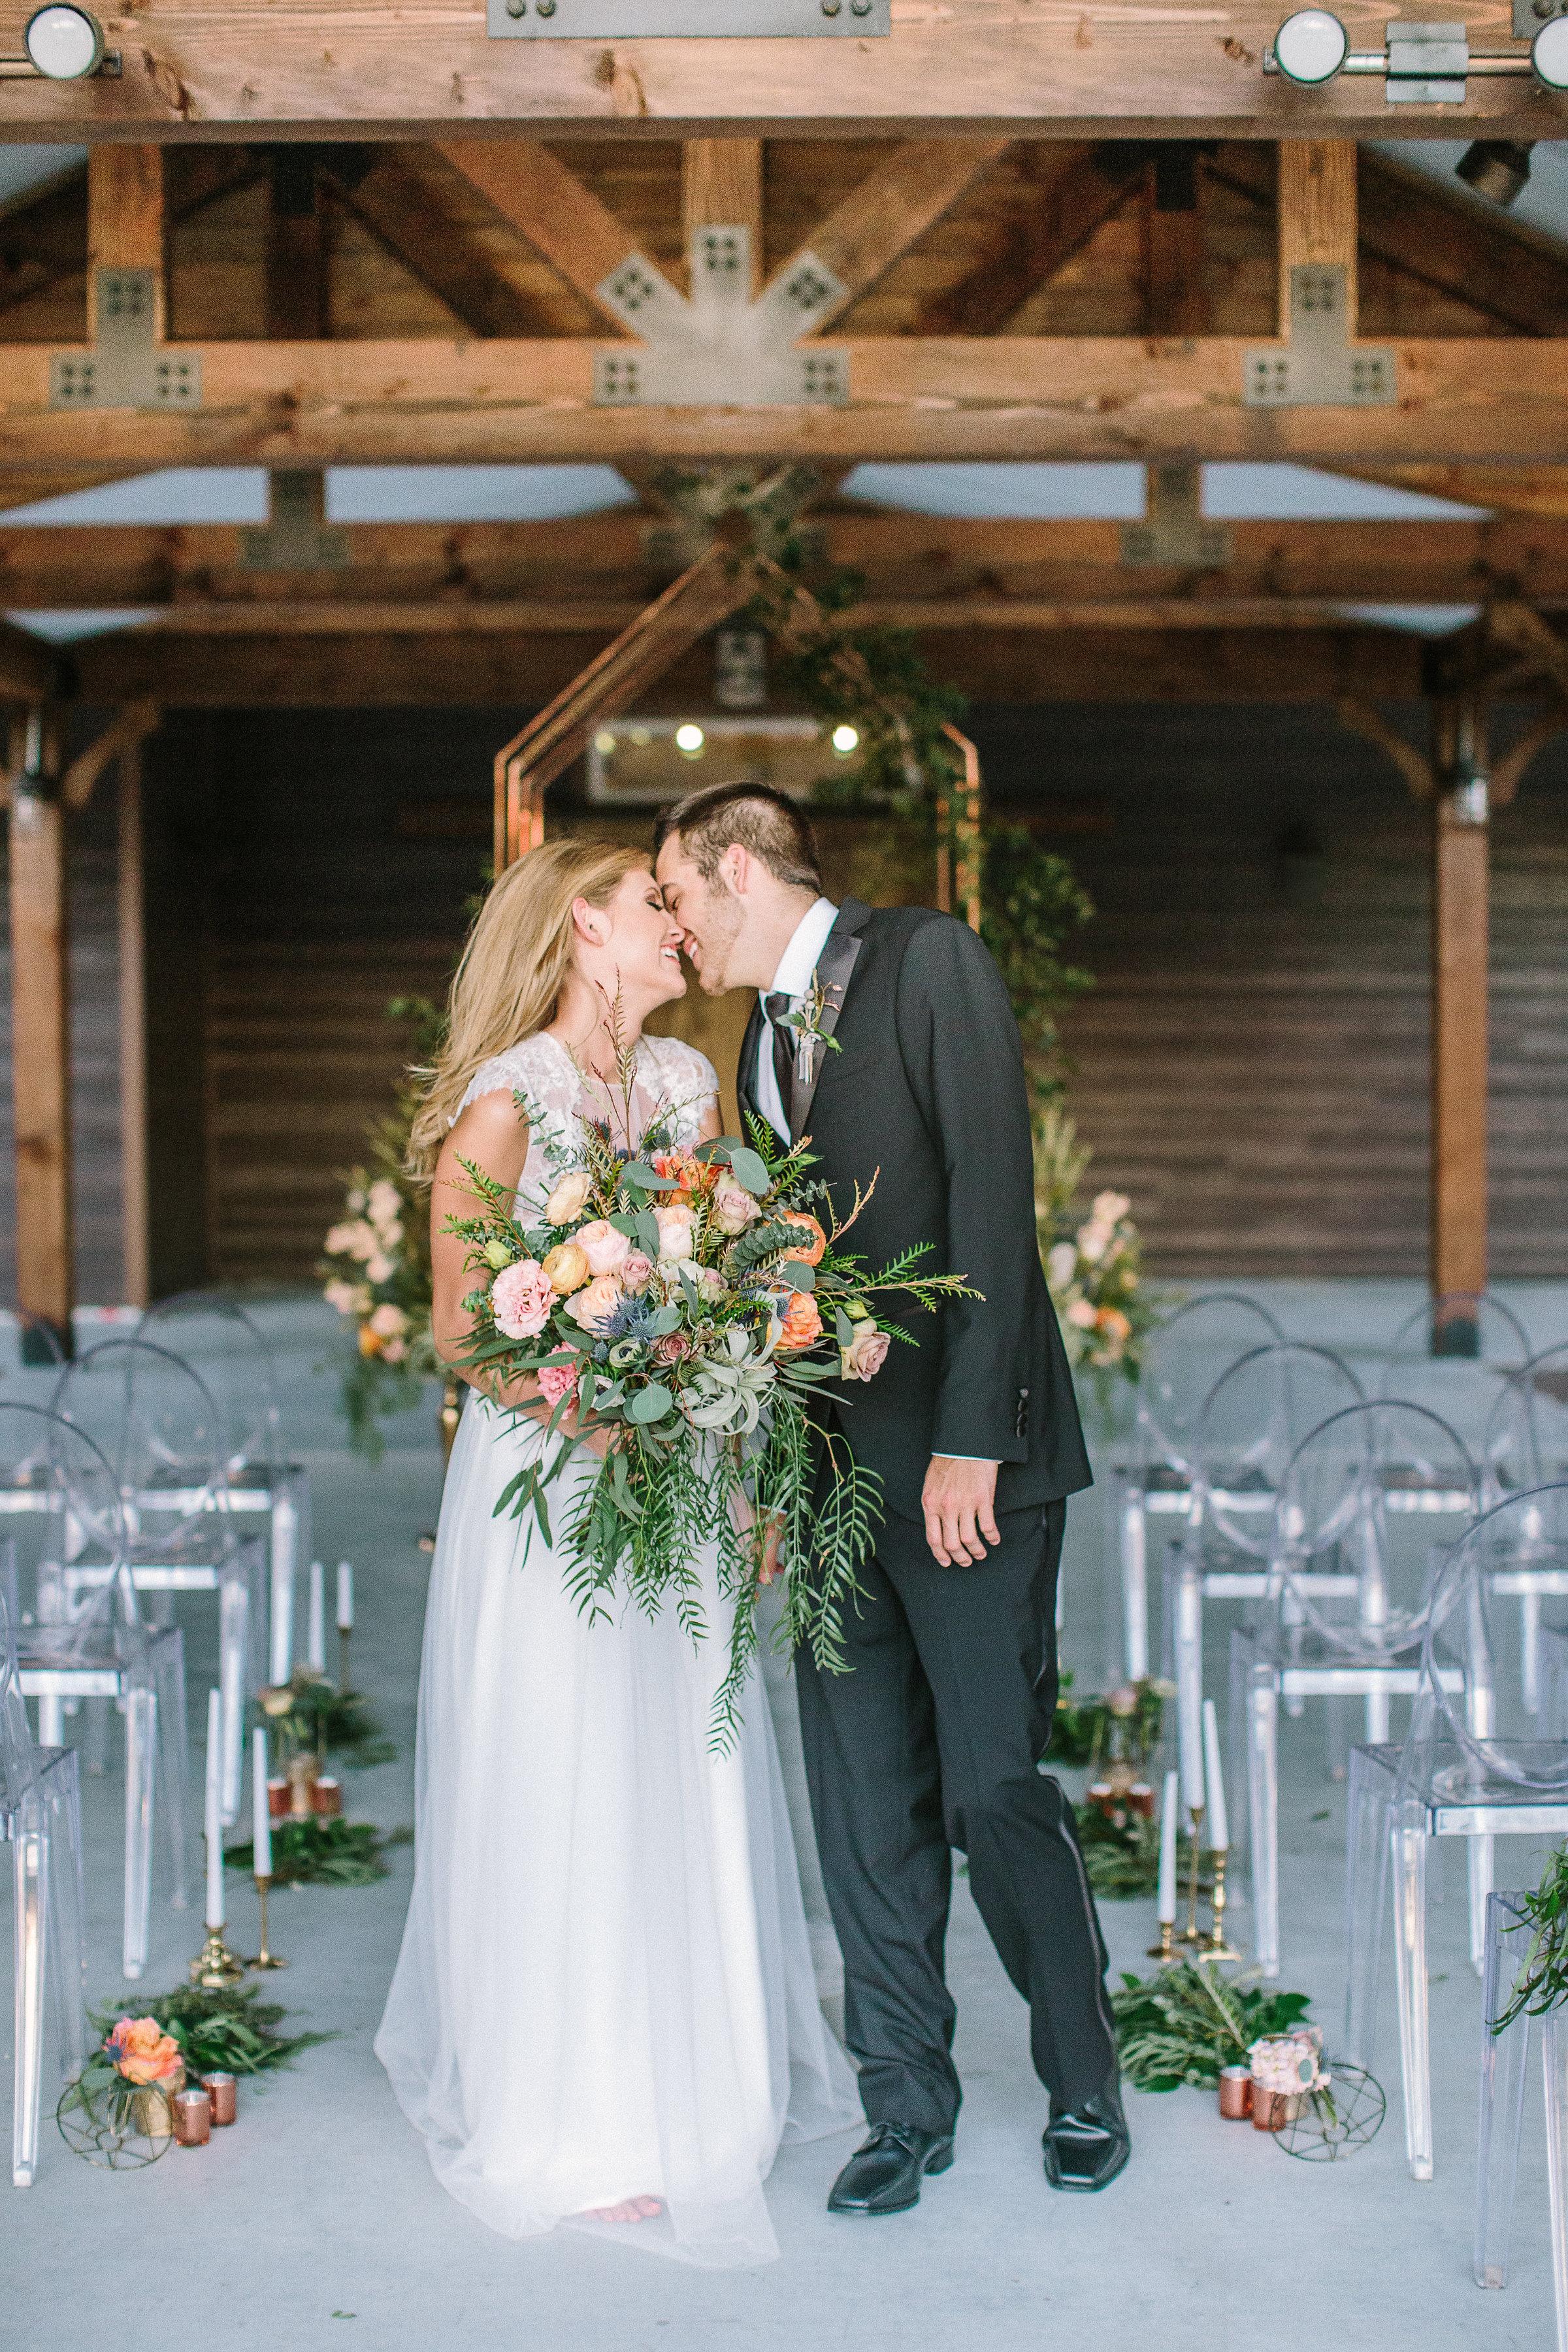 Ellen-Ashton-Photography-Peach-Creek-Ranch-Weddings-Wed-and-Prosper386